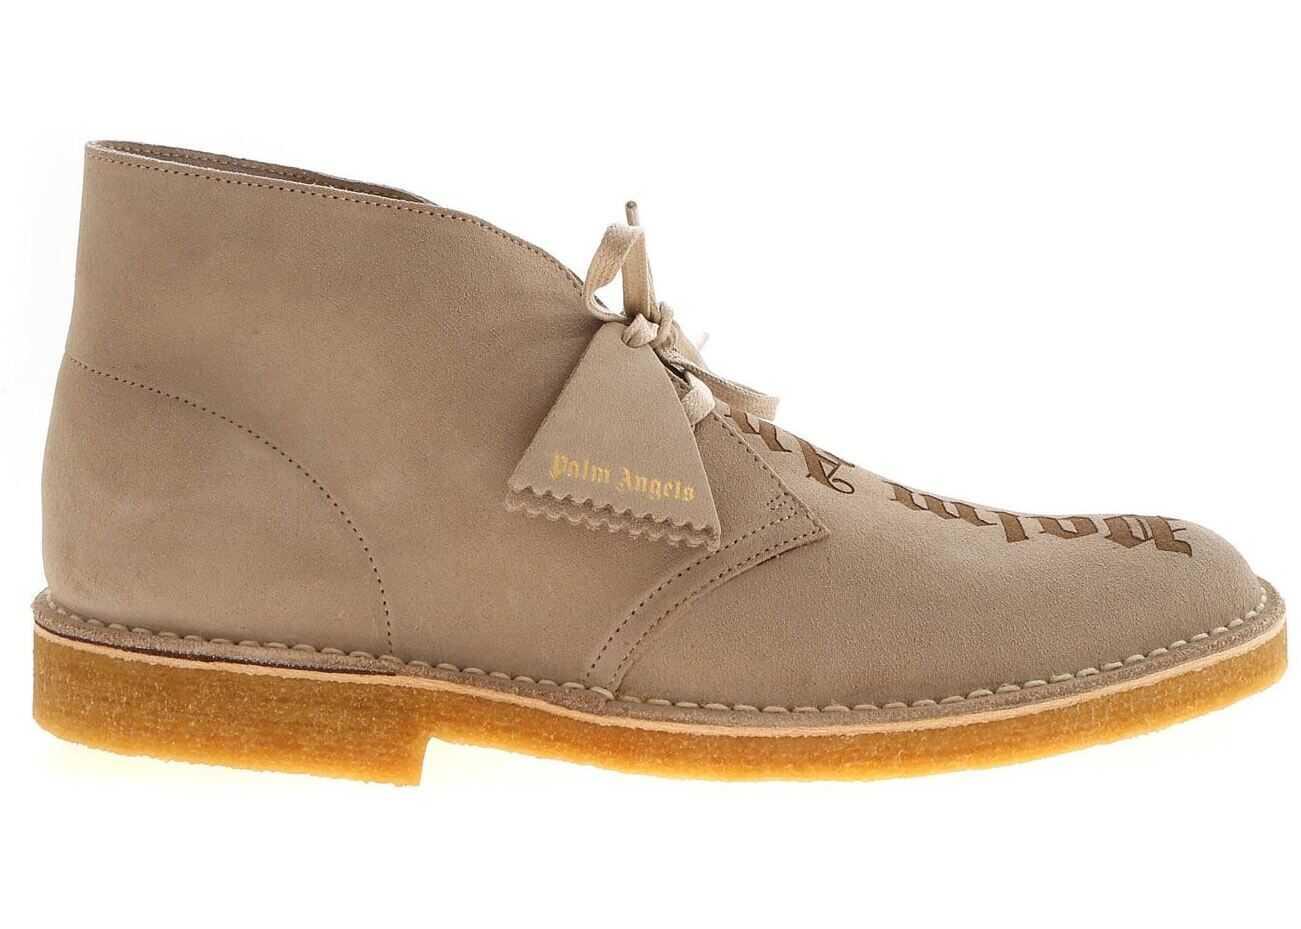 Palm Angels Laser Logo Desert Shoes In Sand Color PMIA050E20LEA0021717 Beige imagine b-mall.ro